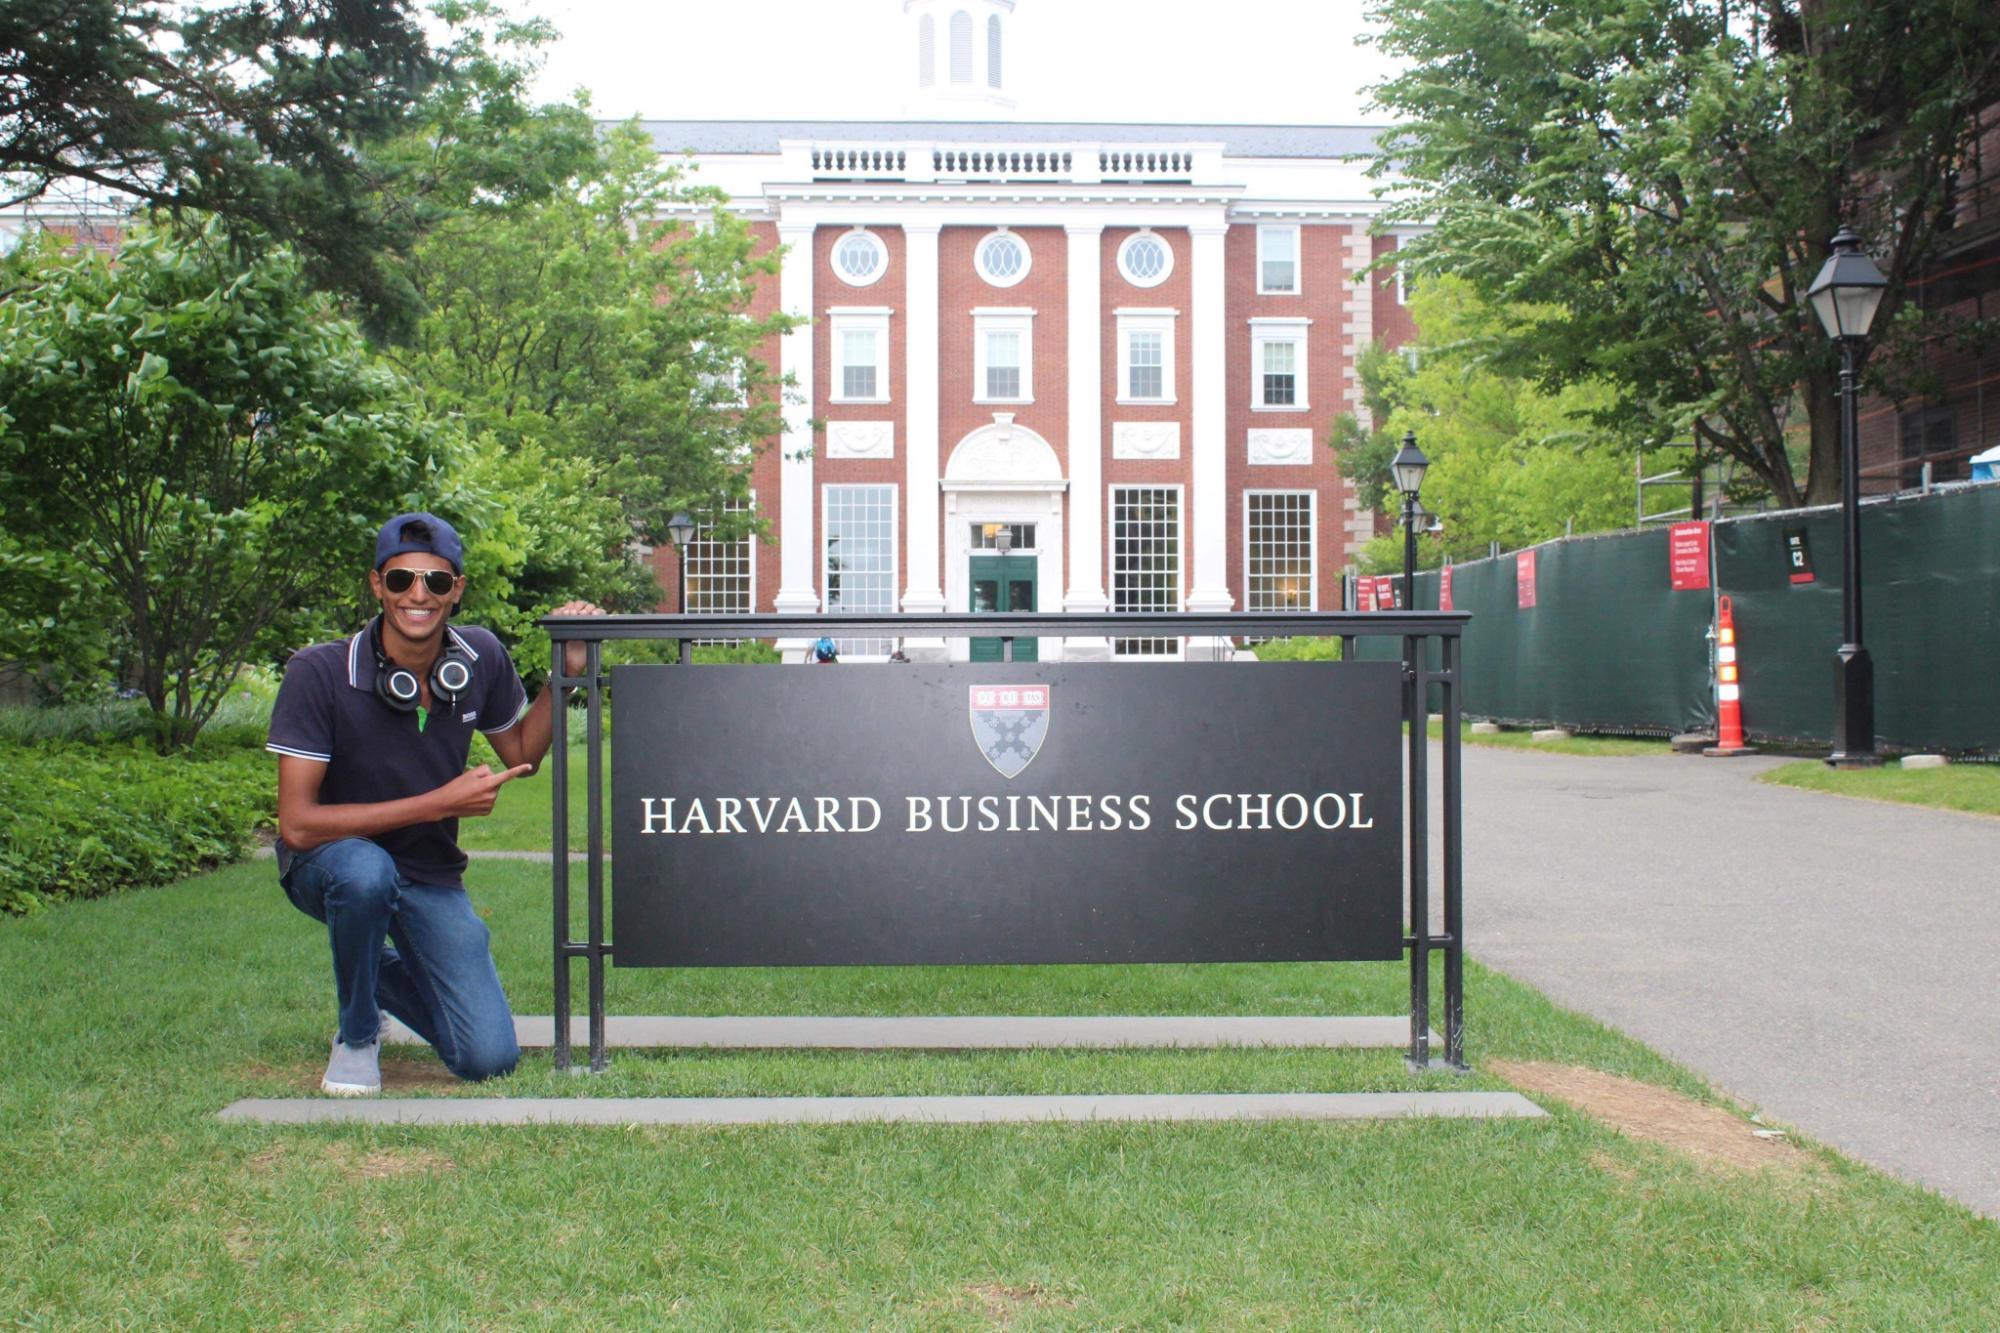 Harvard Summer School - Careers and Employability